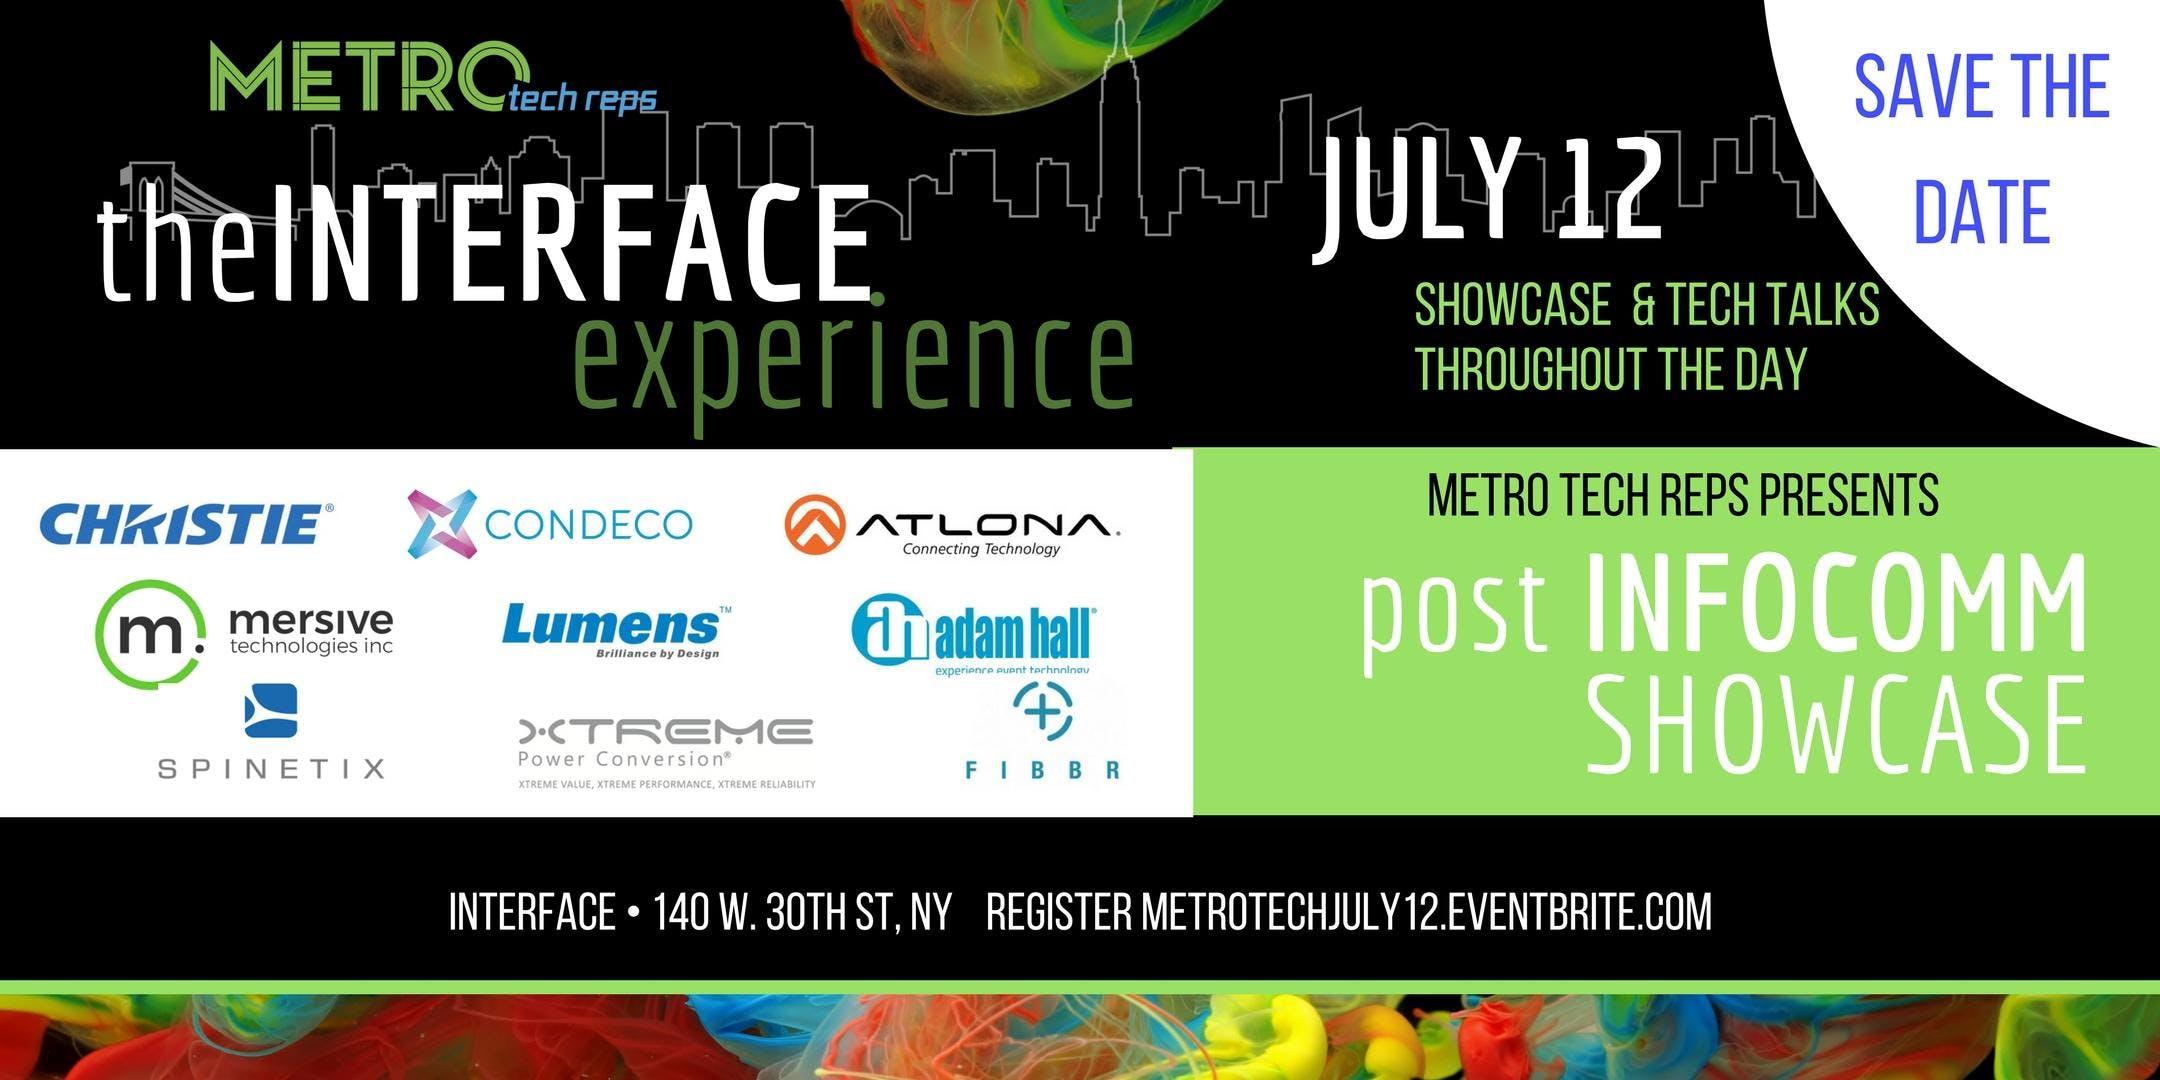 theINTERFACE experience - Post InfoComm 2018 Showcase